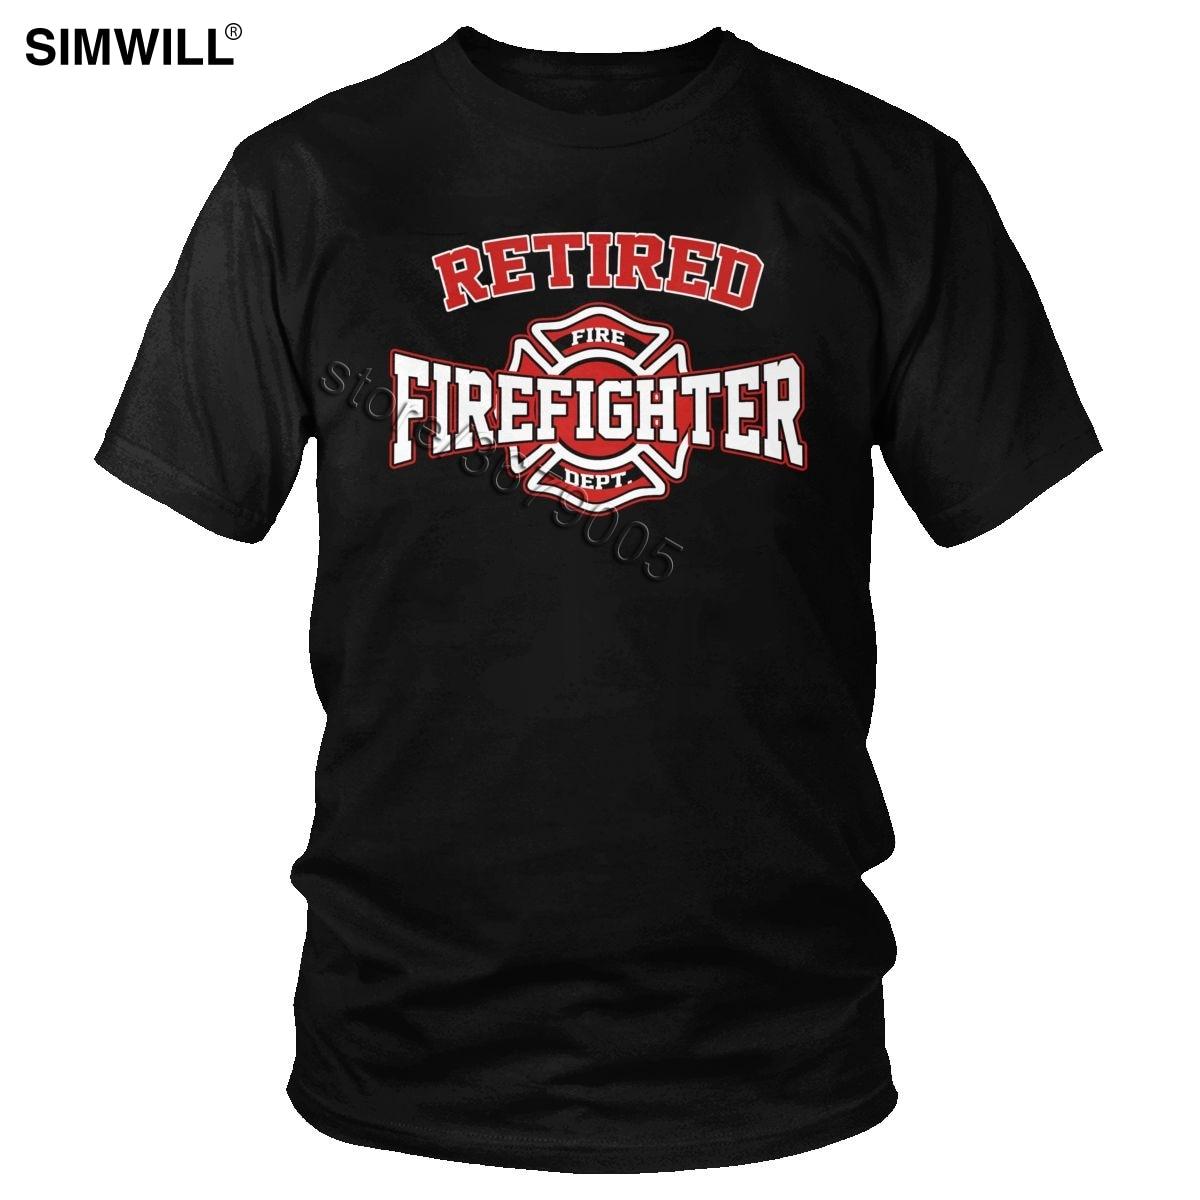 Moda urbana Retired Fighter Tee hombres algodón Fire Rescue Hero Camiseta de manga corta de bomberos camiseta regalo Idea Ropa Camisetas